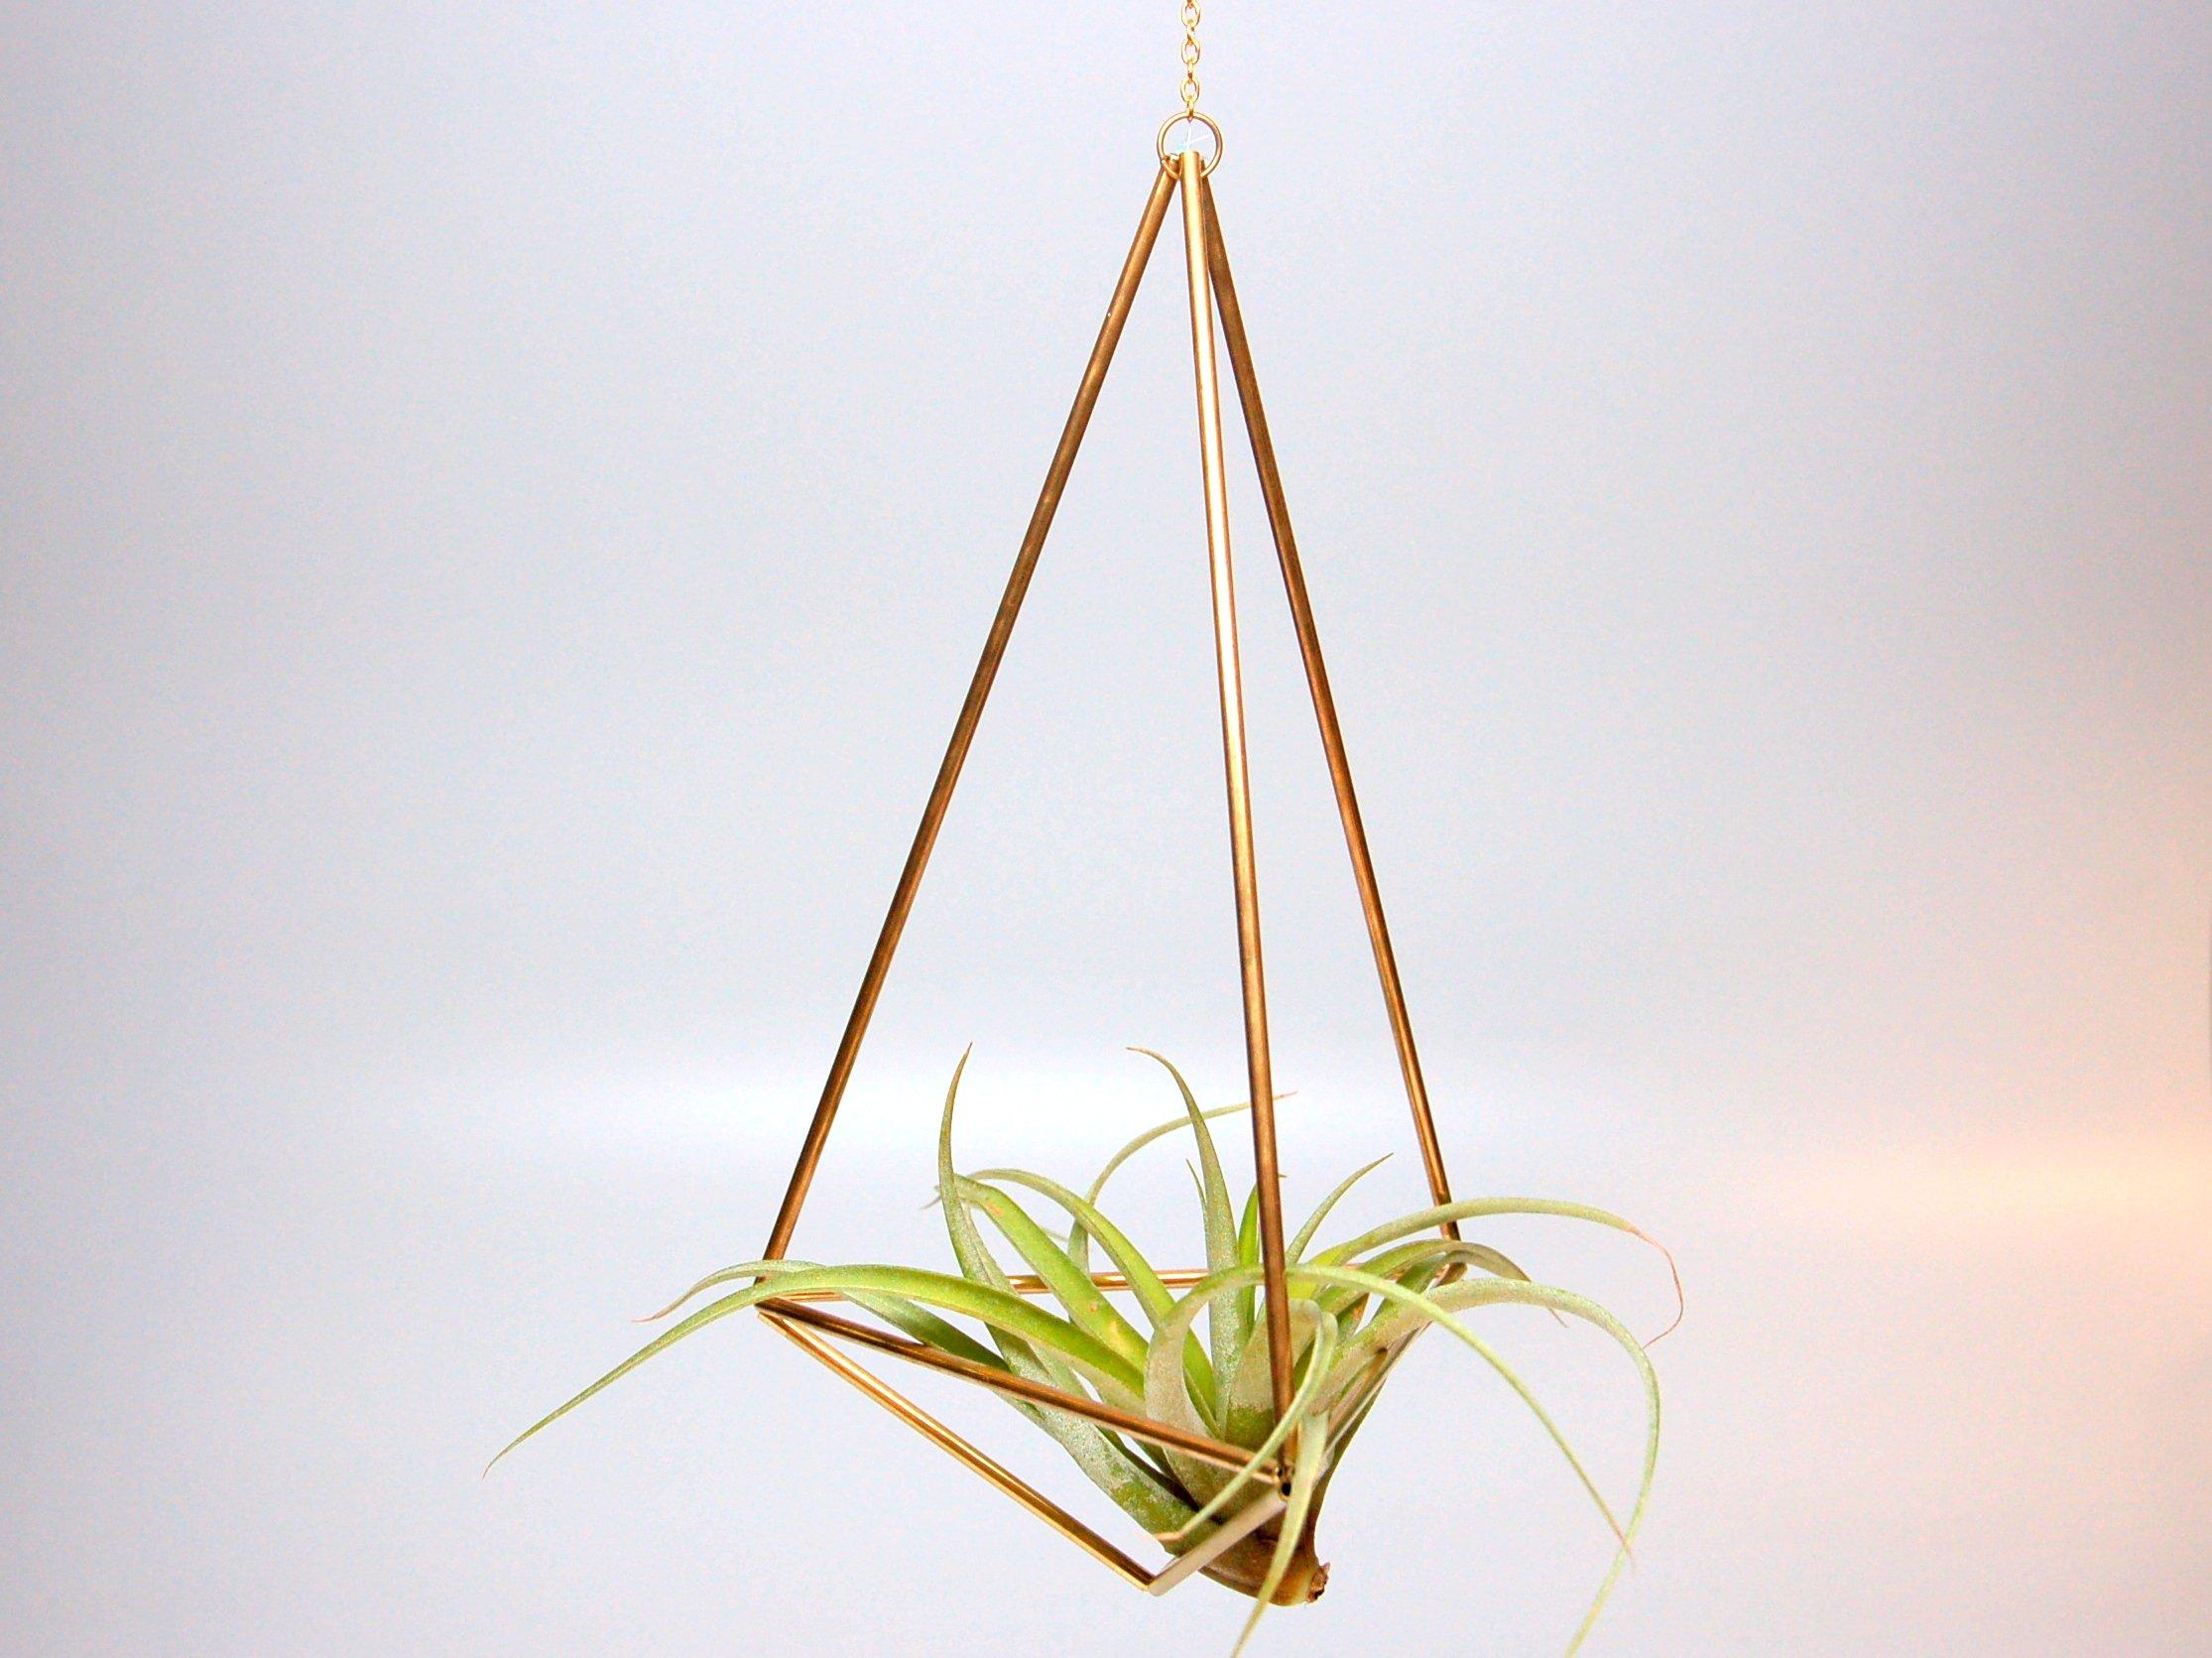 Design 22 - Large Hanging Brass Geometric Ornament (Himmeli) - Air Plant, Terrarium, Hanging Planter by The Garden Home